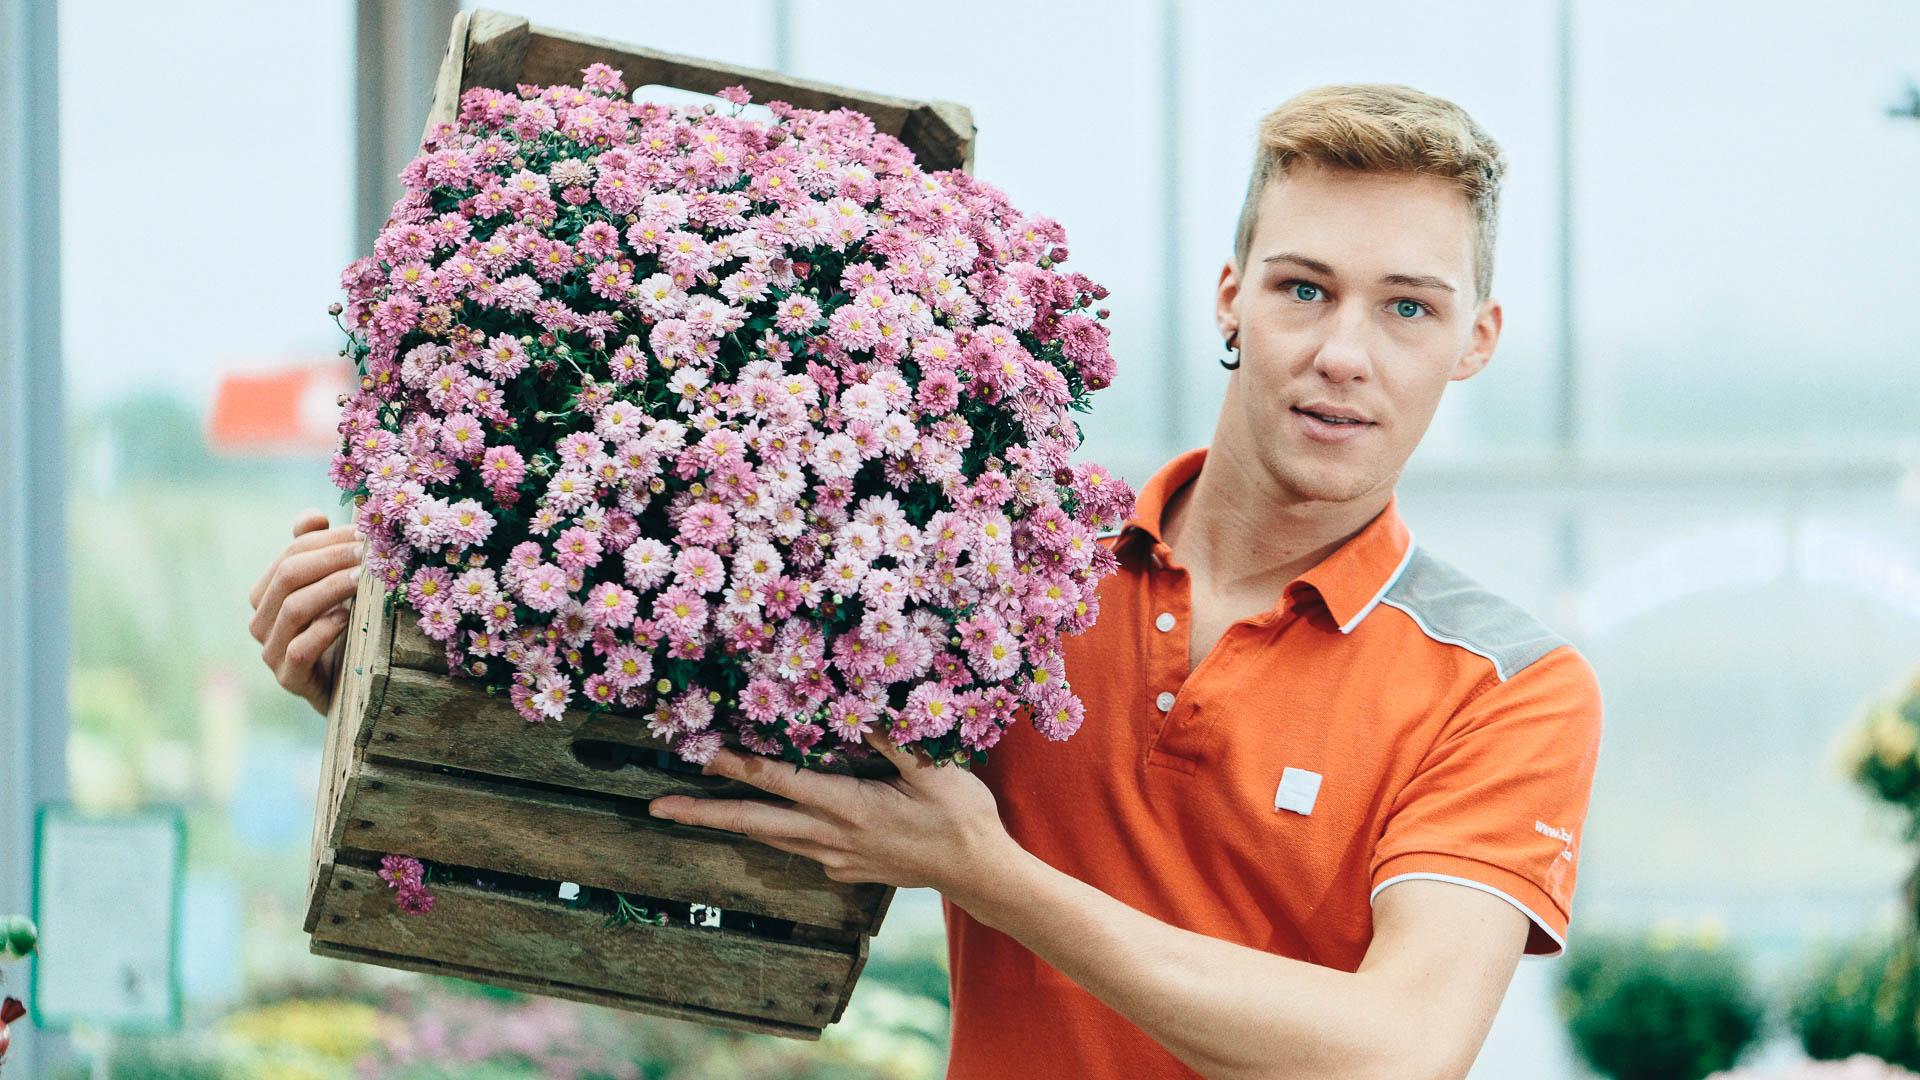 Markus Schneeberger Businessfotografie - bellaflora  MG 7950 DxO - Home